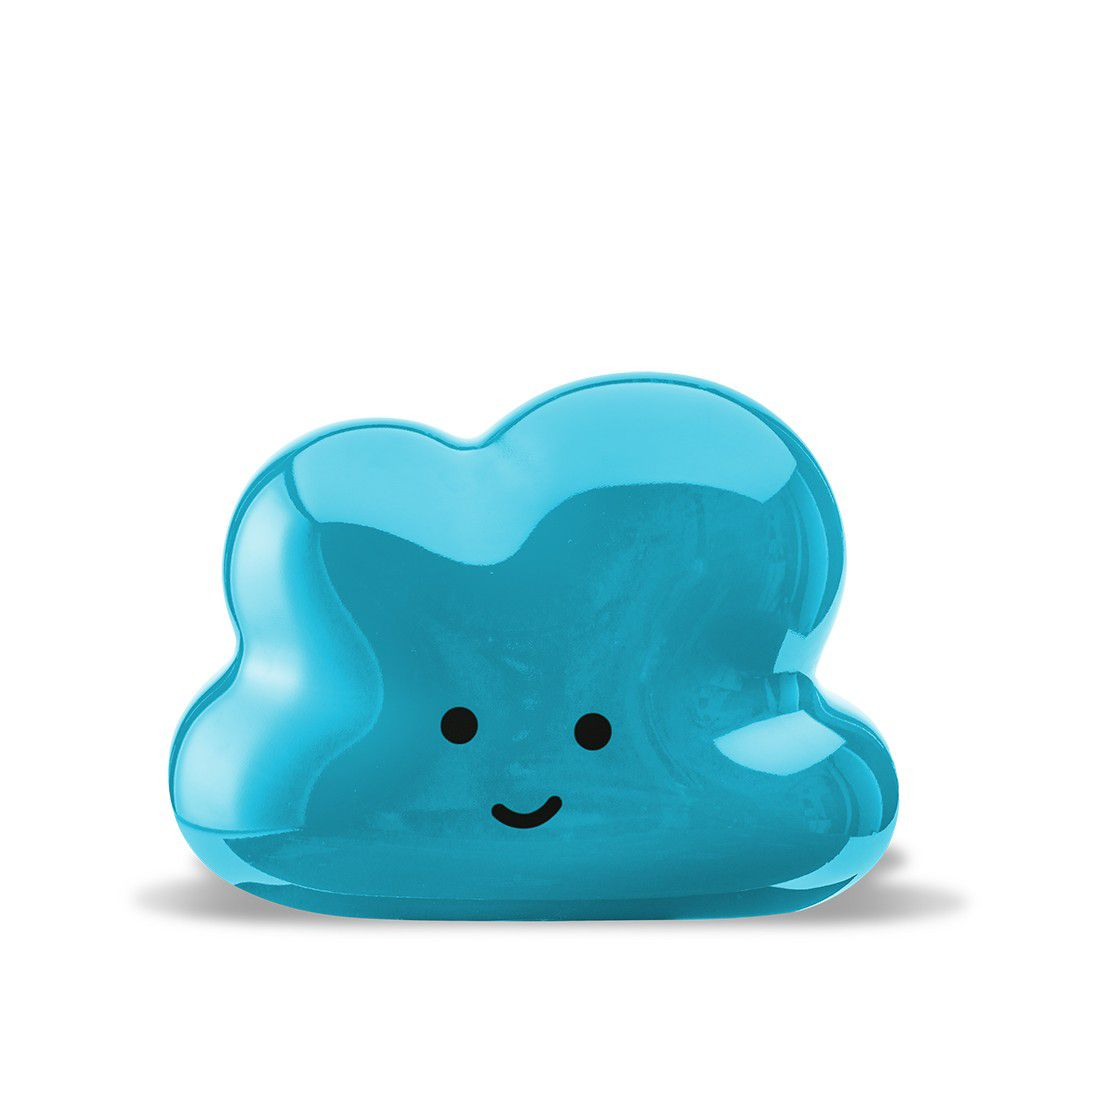 Nuvem Decorativa Laqueada Azul